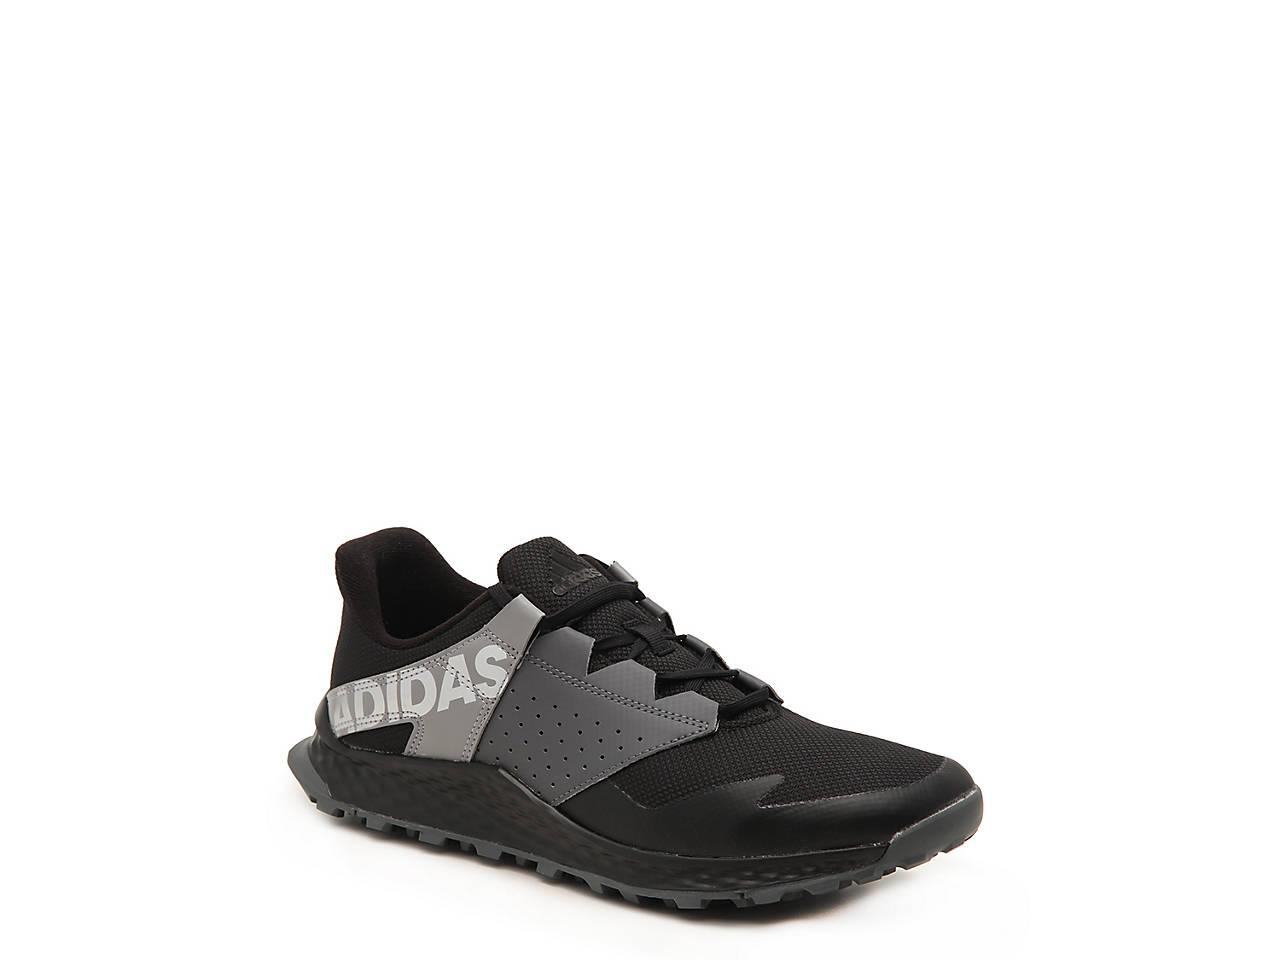 adidas Vigor Bounce Toddler   Youth Running Shoe Kids Shoes  ffedb5ebb